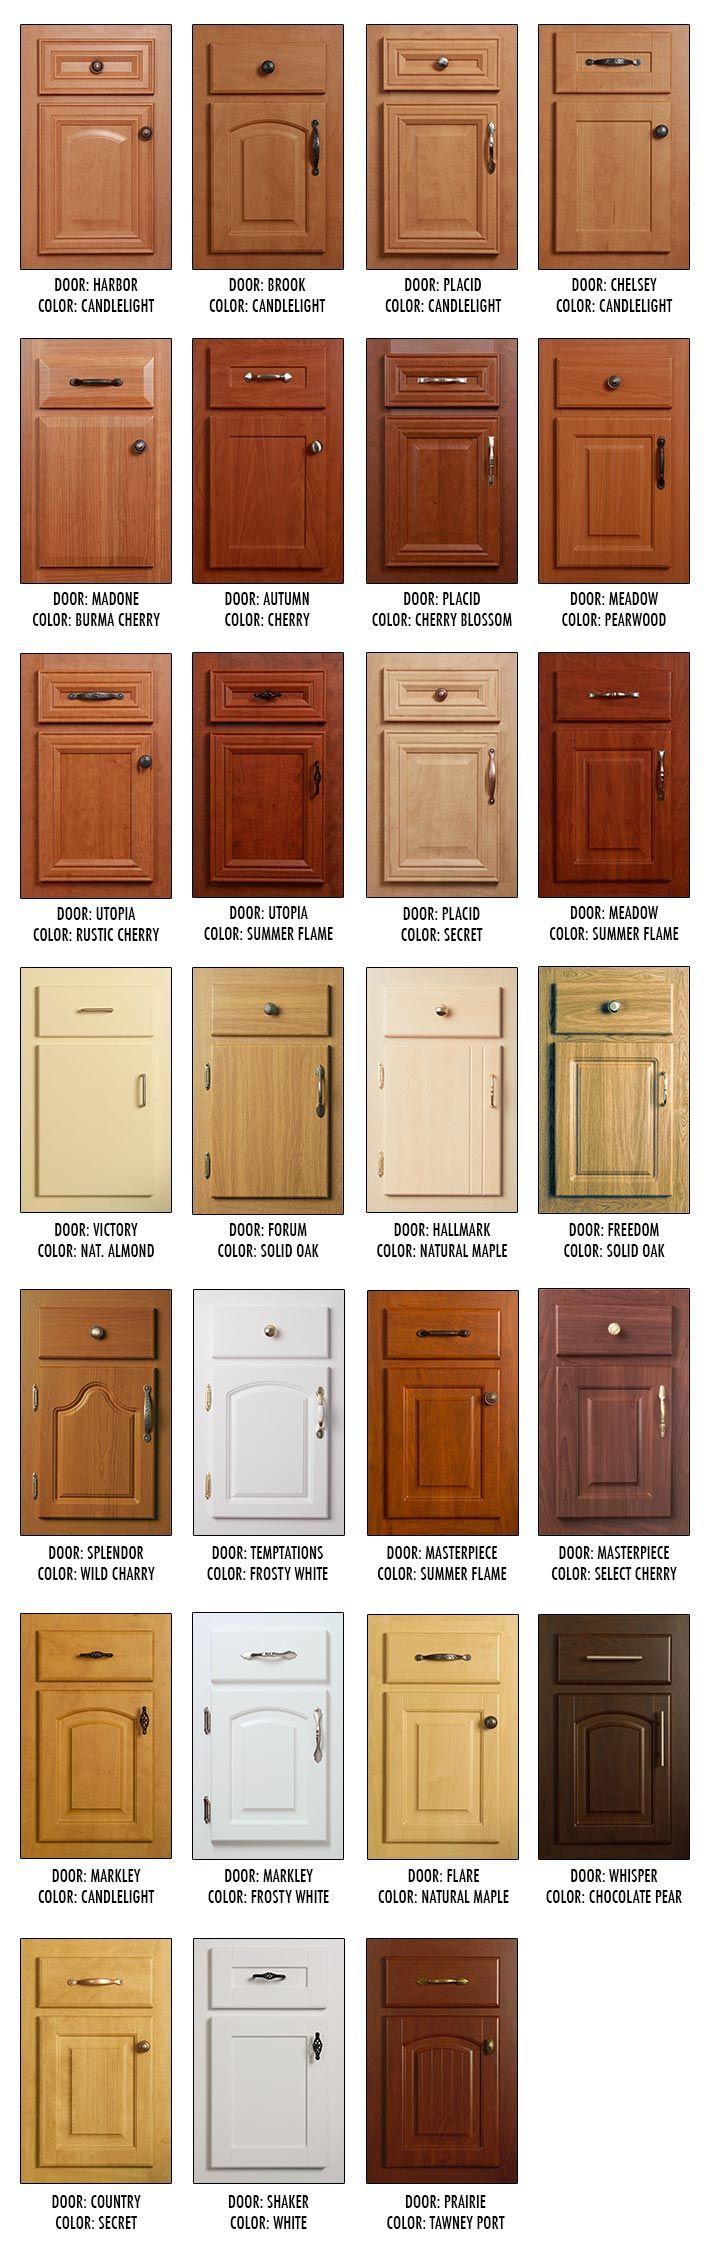 15 Best Kitchen Cabinet Doors Images On Pinterest